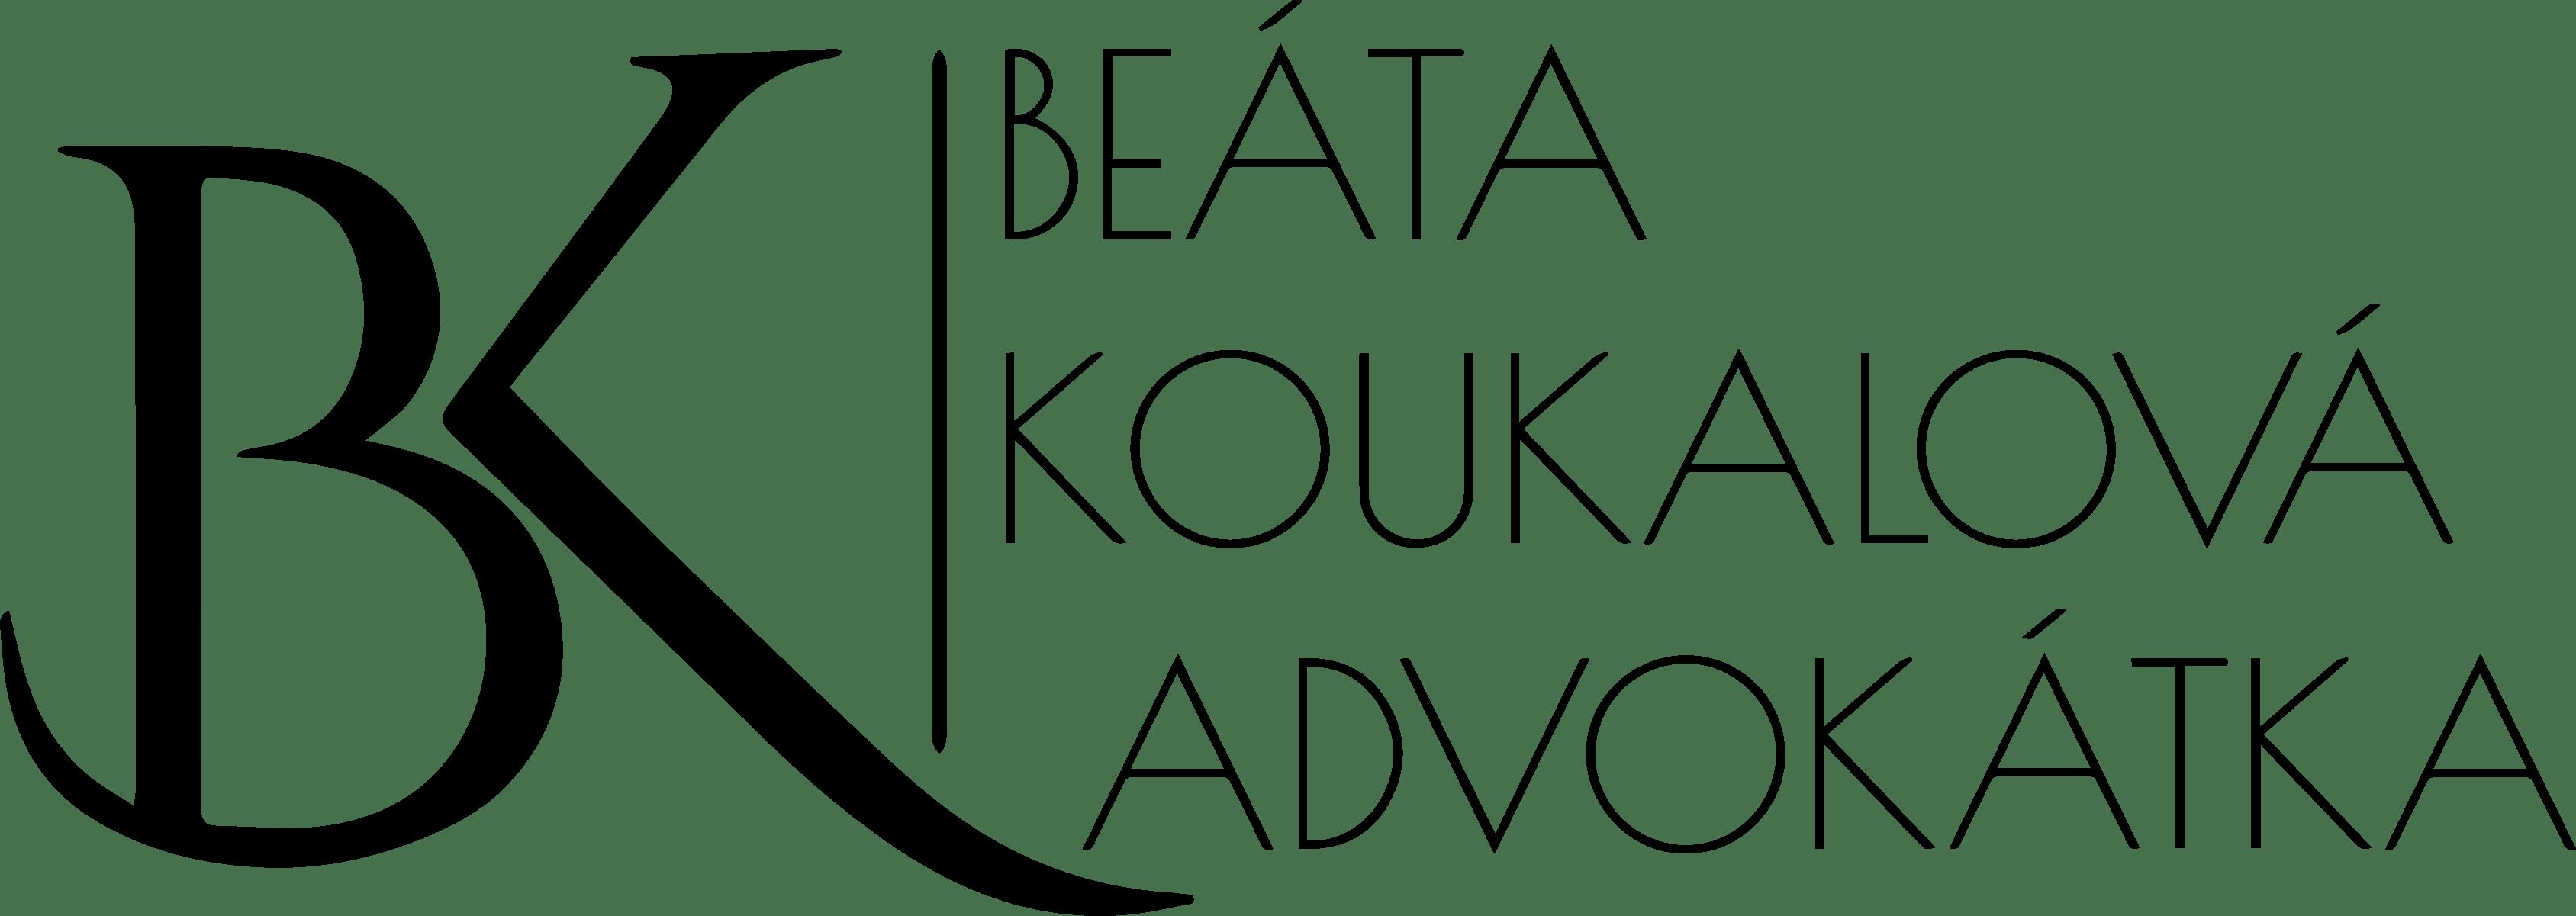 Beáta Koukalová advokátka Brno